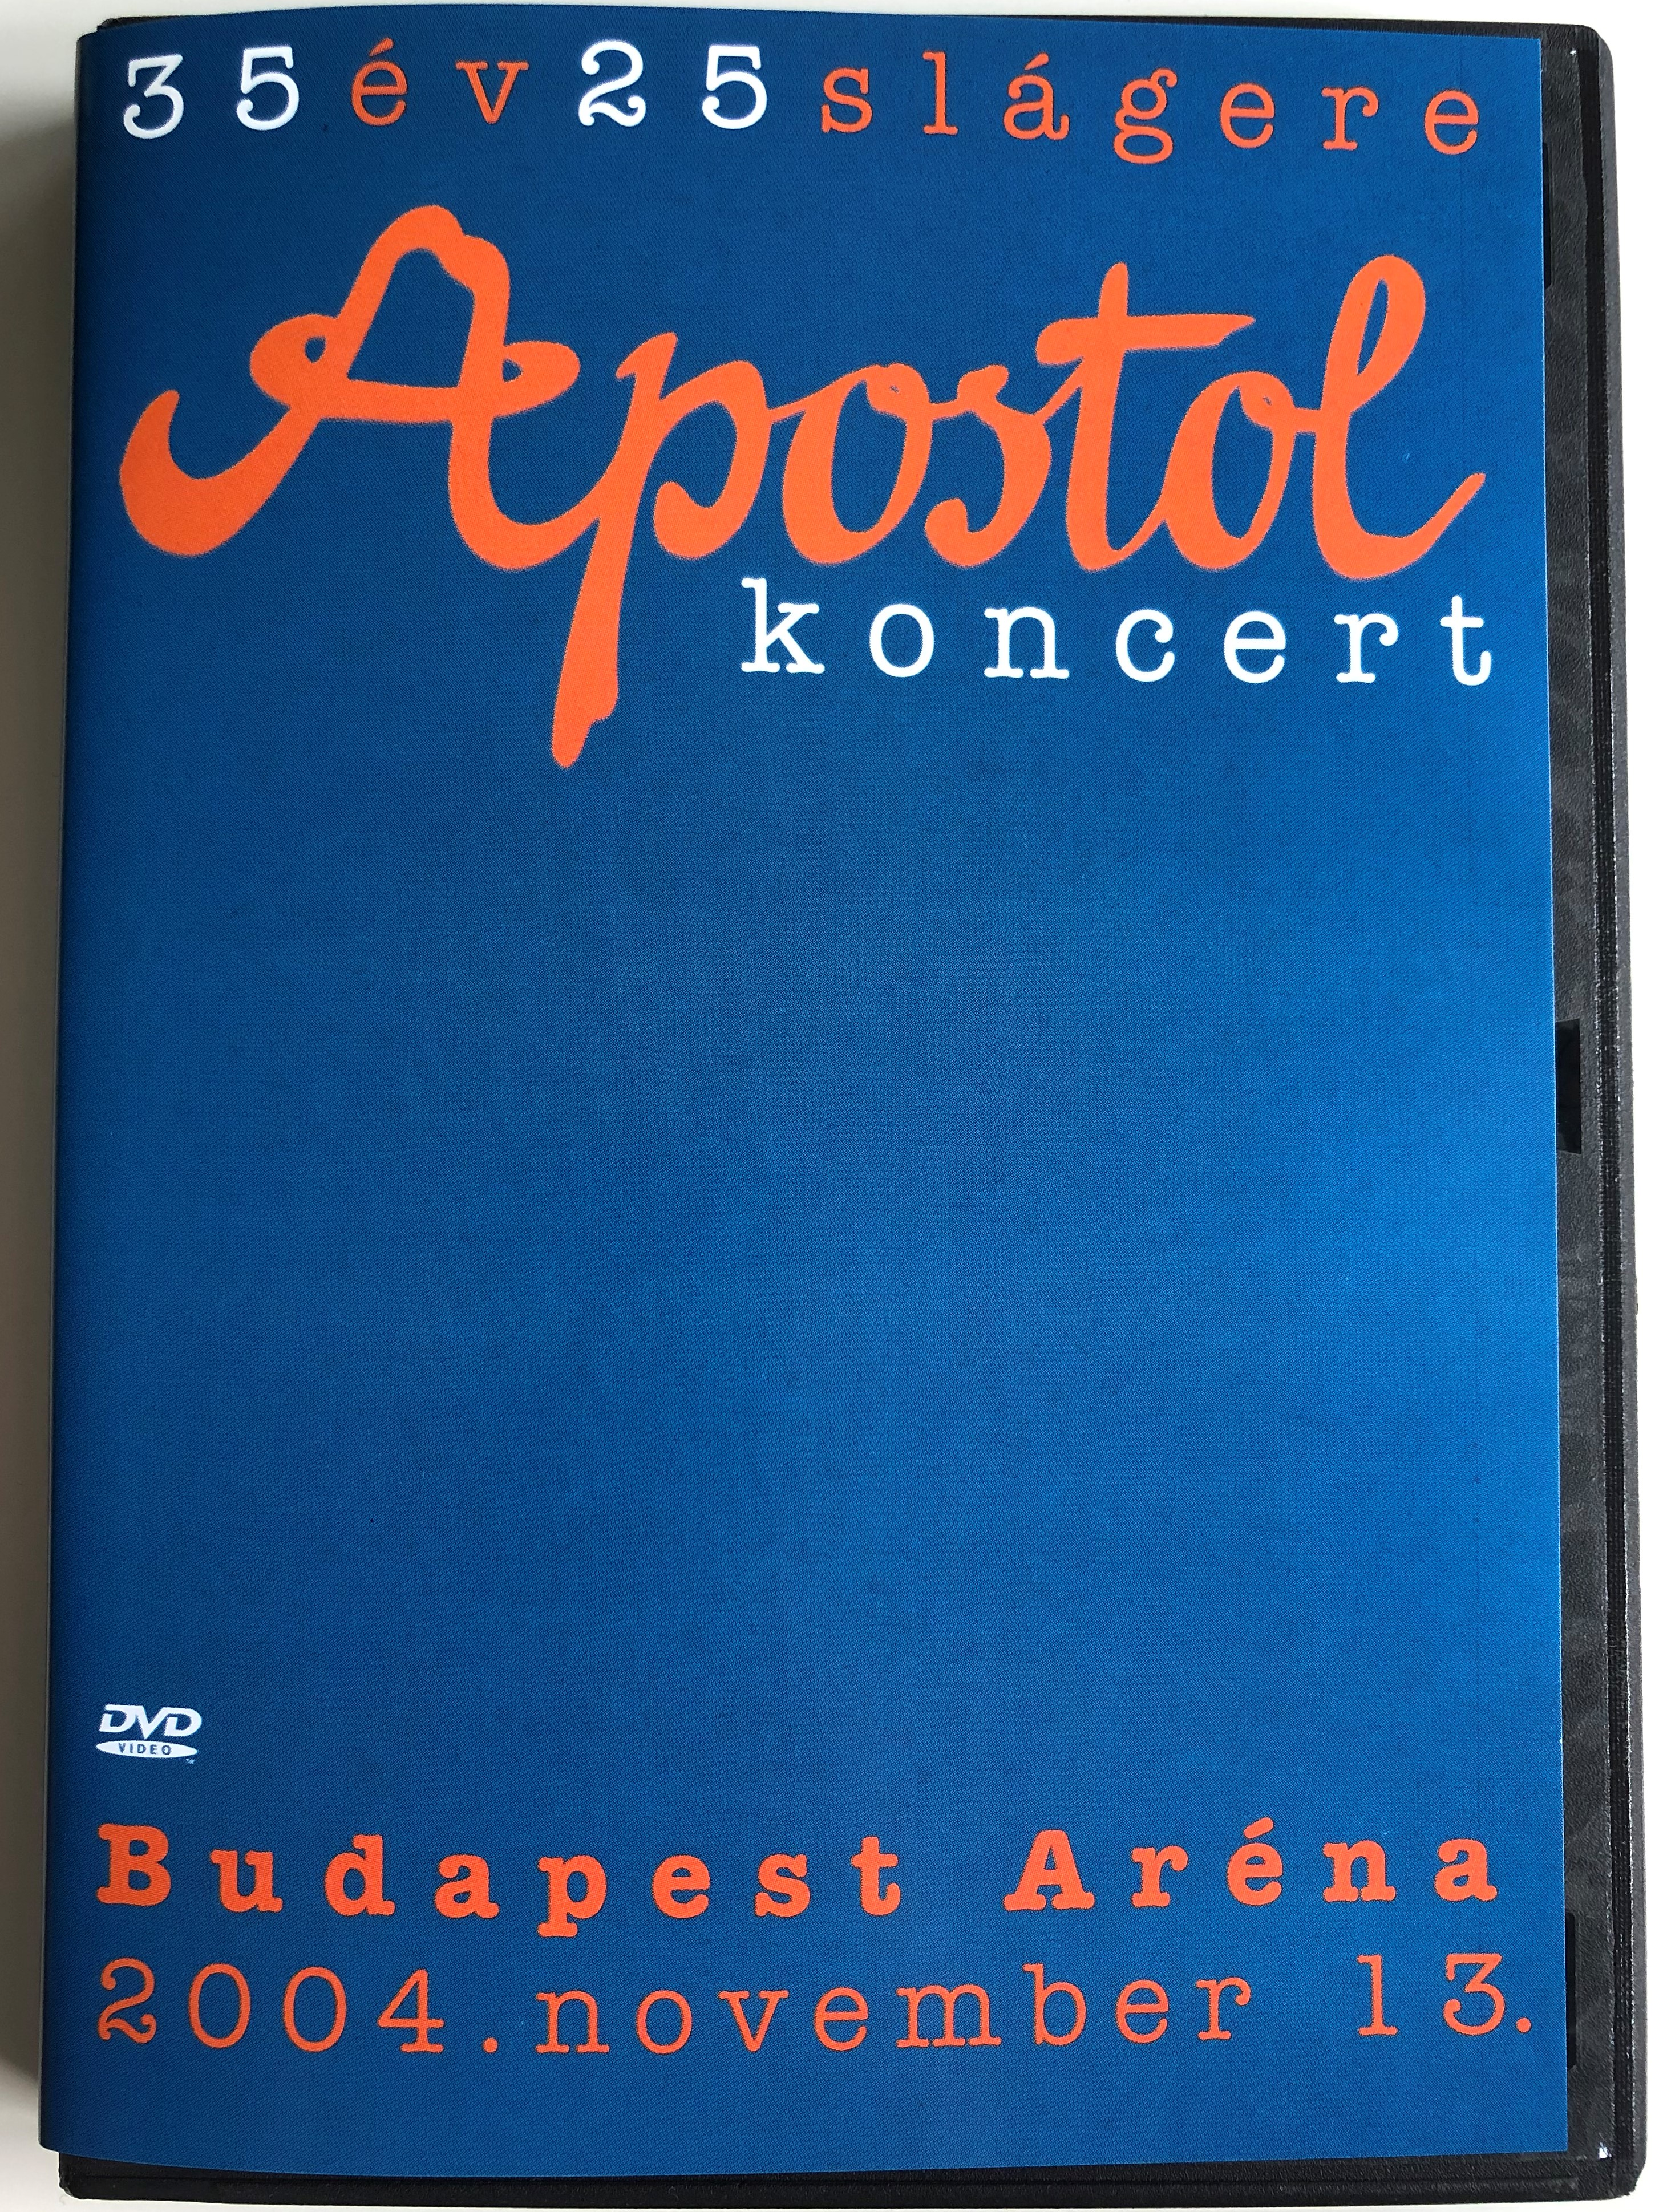 apostol-koncert-dvd-2006-35-v-25-sl-gere-budapest-ar-na-2004-november-13.-tom-tom-records-1-.jpg